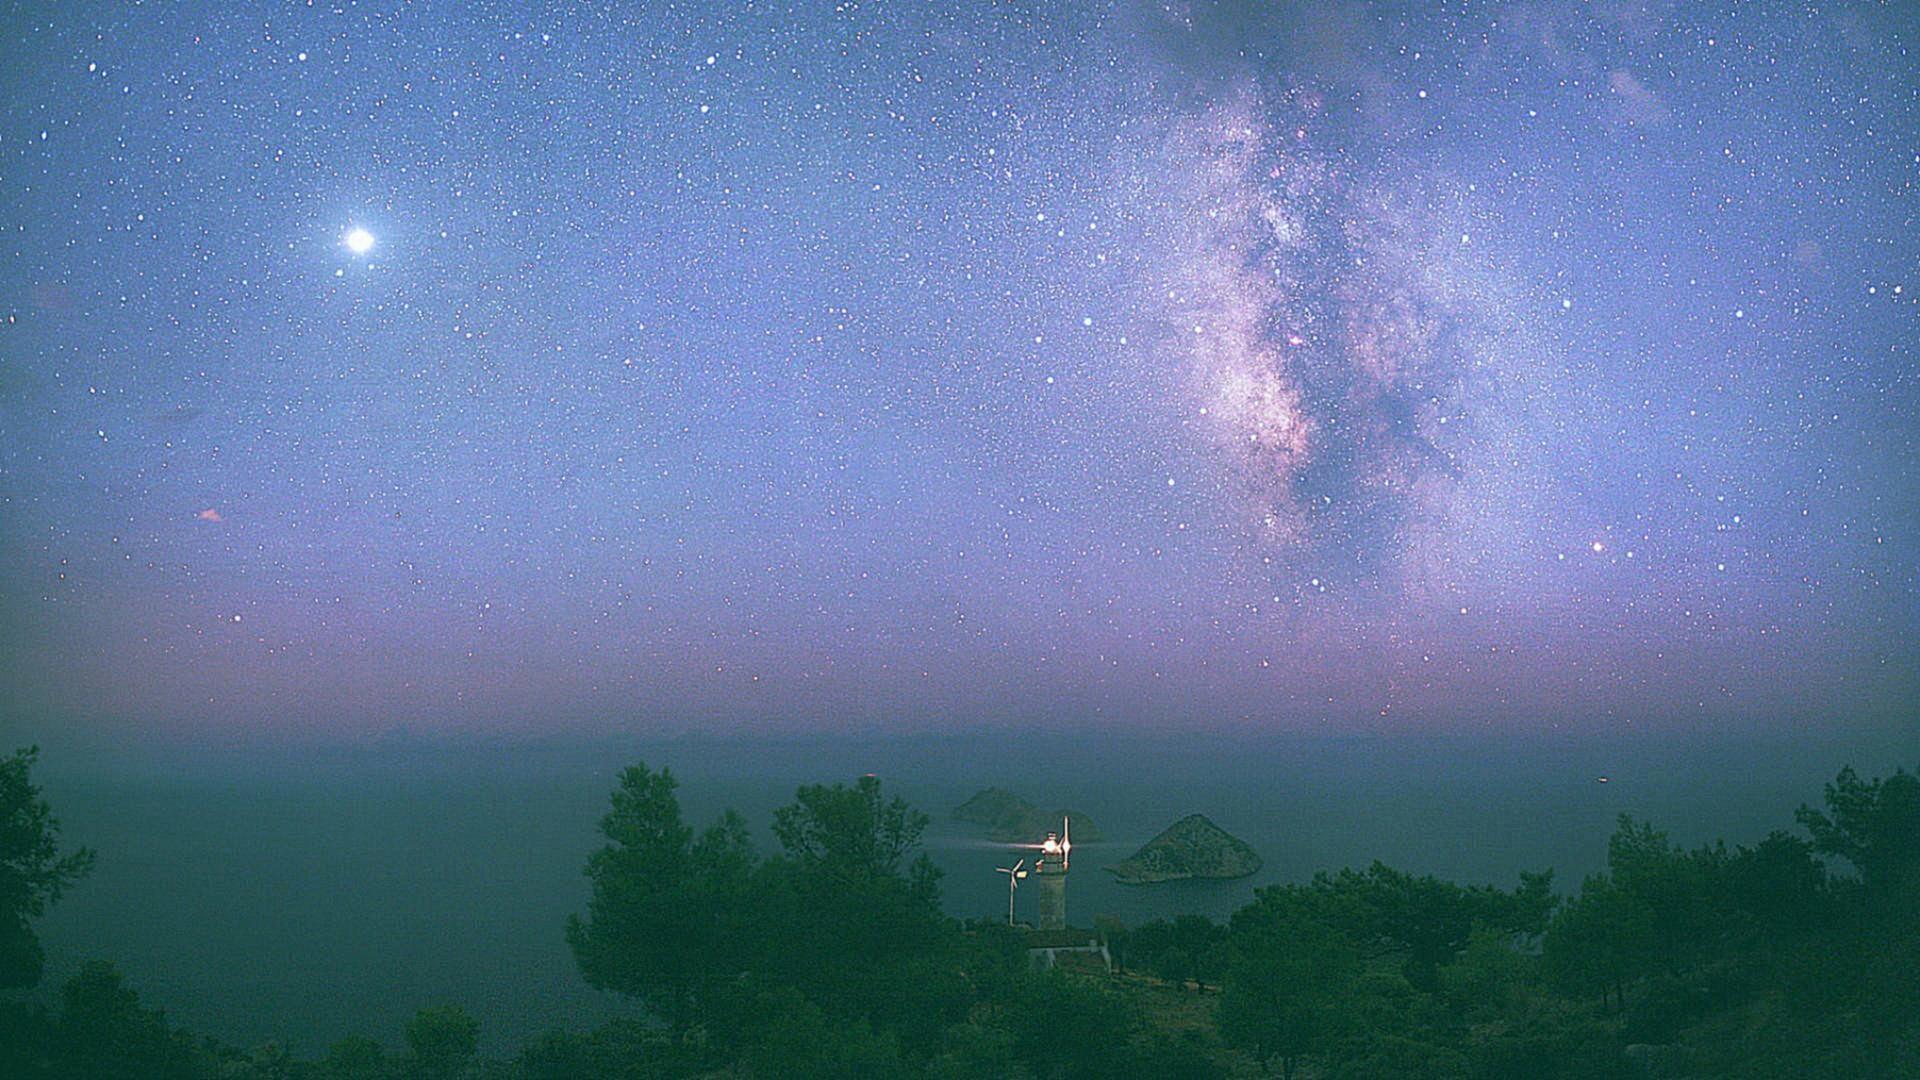 wallpaper.wiki-Sun-Moon-Stars-Wallpaper-HD-PIC-